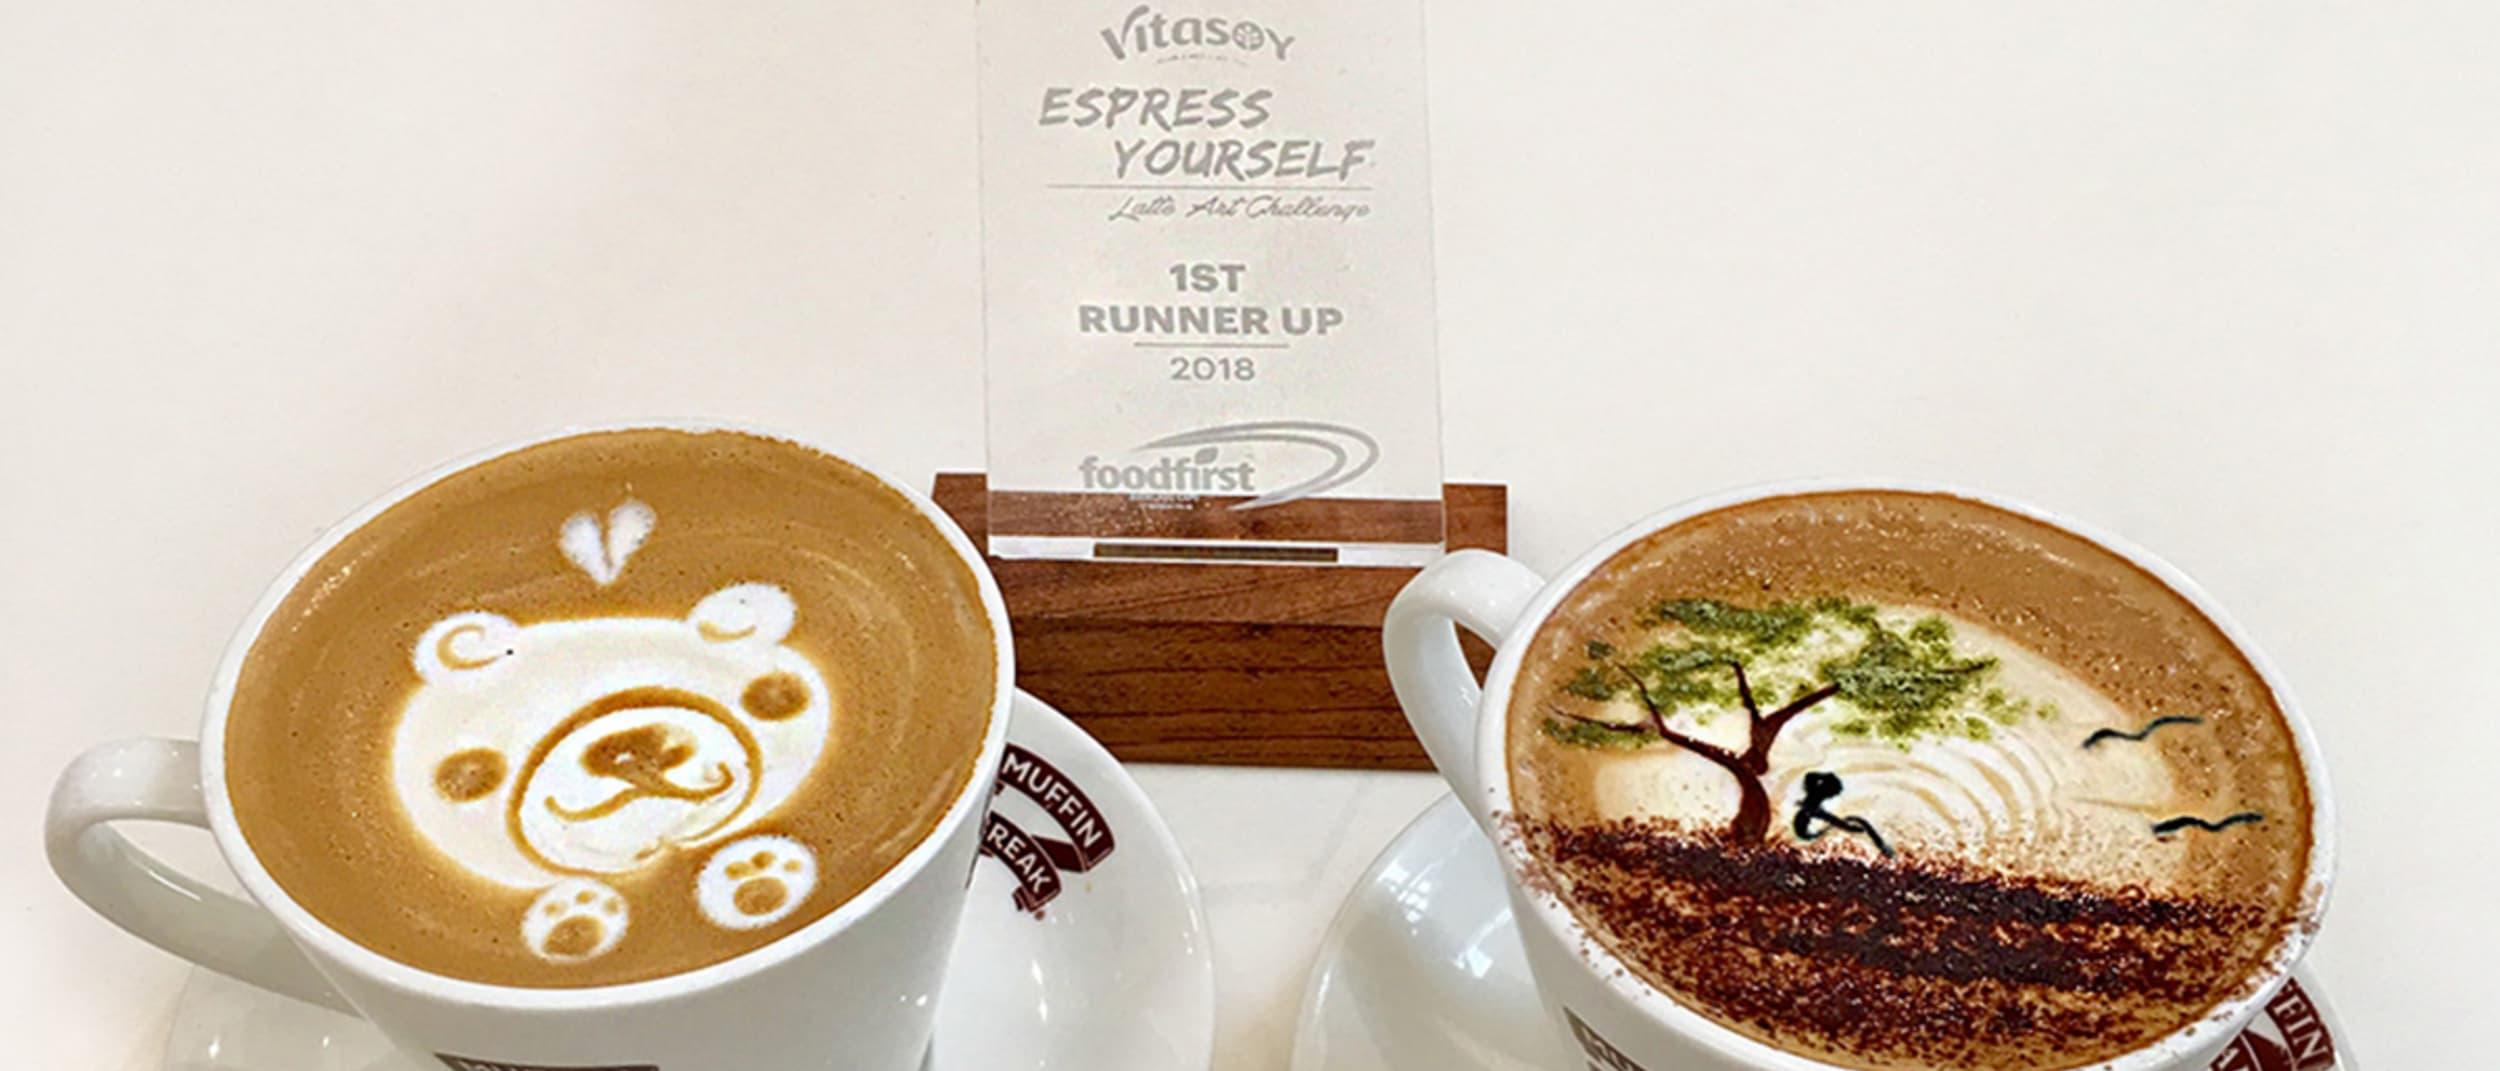 Muffin Break coffee art